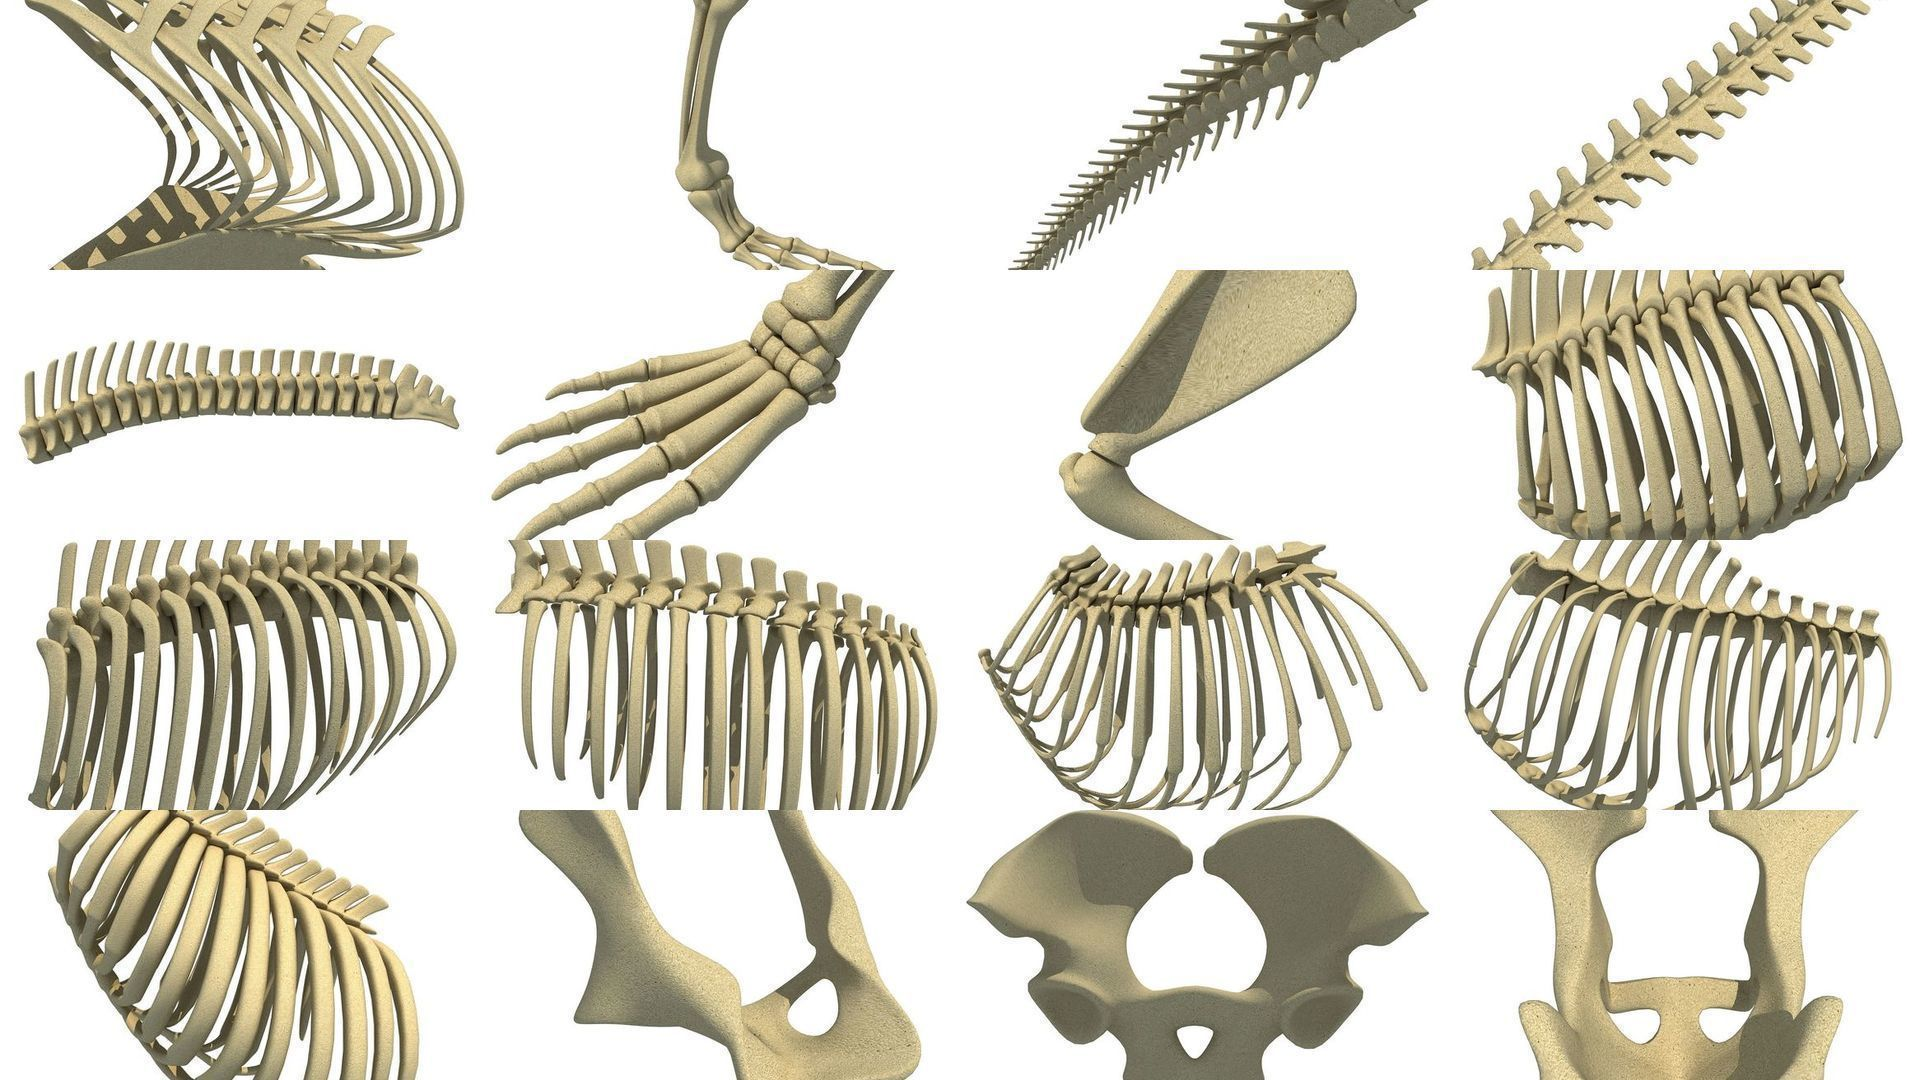 Animal Bones Collection |